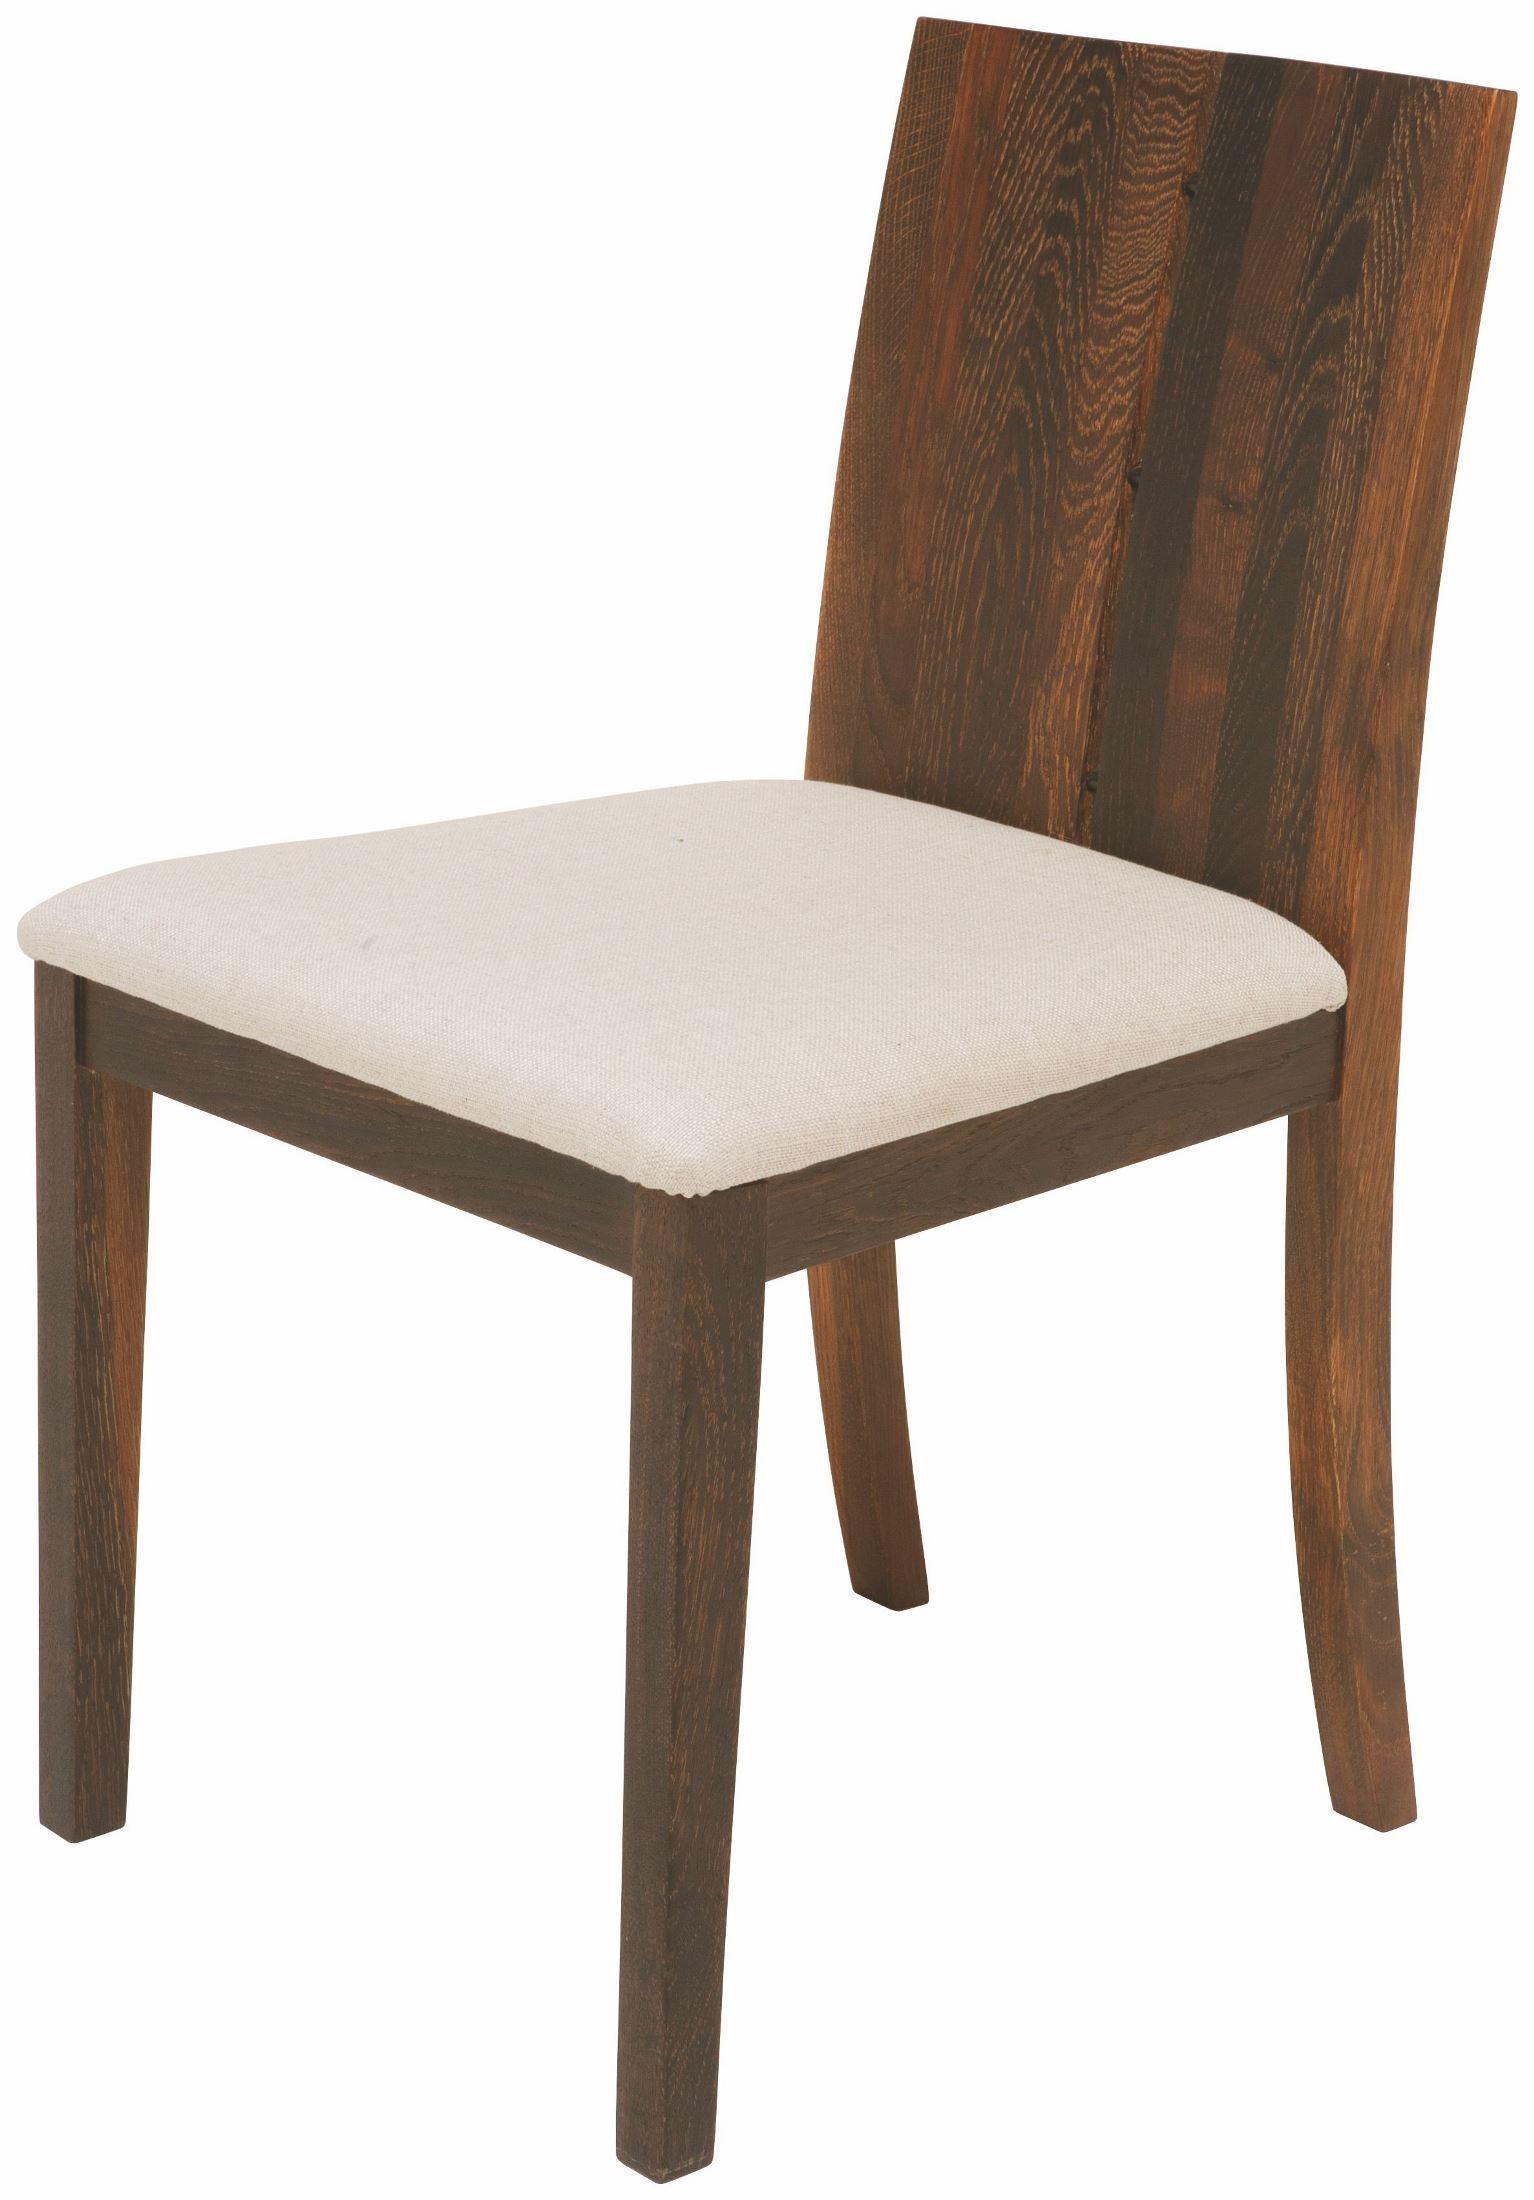 Eva Beige Fabric Dining Chair HGSR284 Nuevo